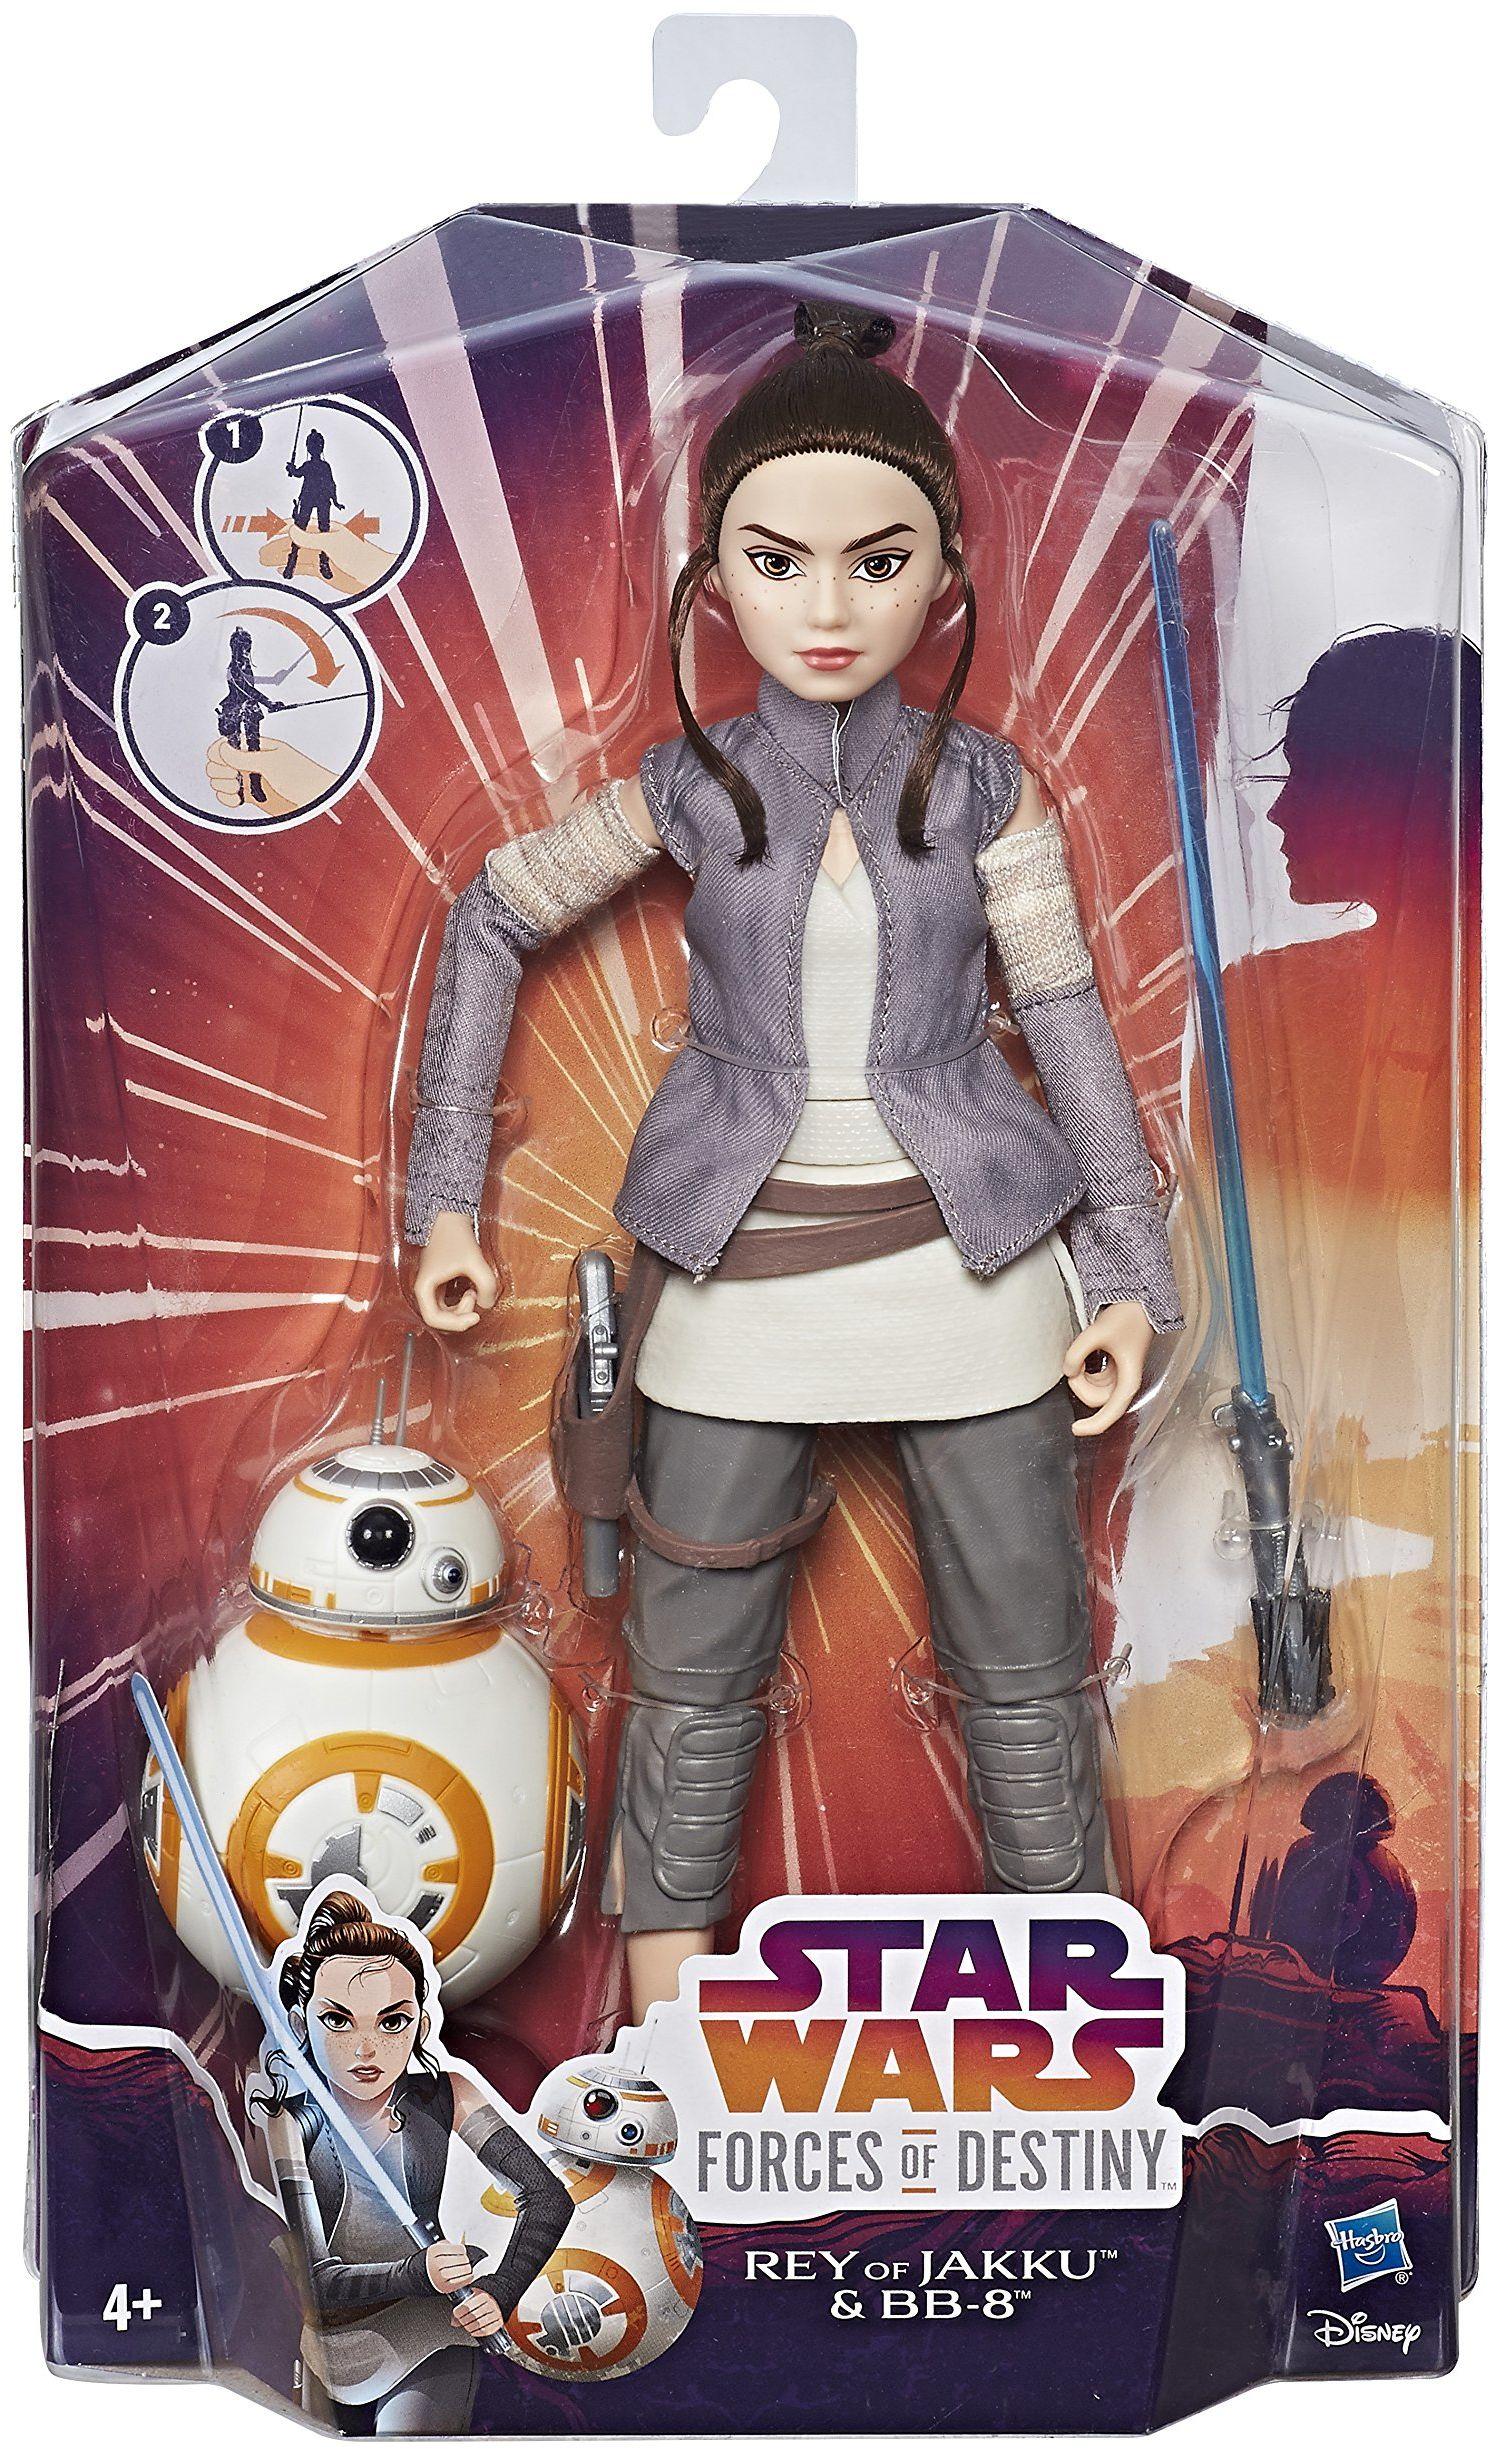 Hasbro Star Wars C1628ES0 - Moc Schicksals 11 cali Deluxe Action lalki zestaw 2 szt. - Rey i BB8, figurki akcji